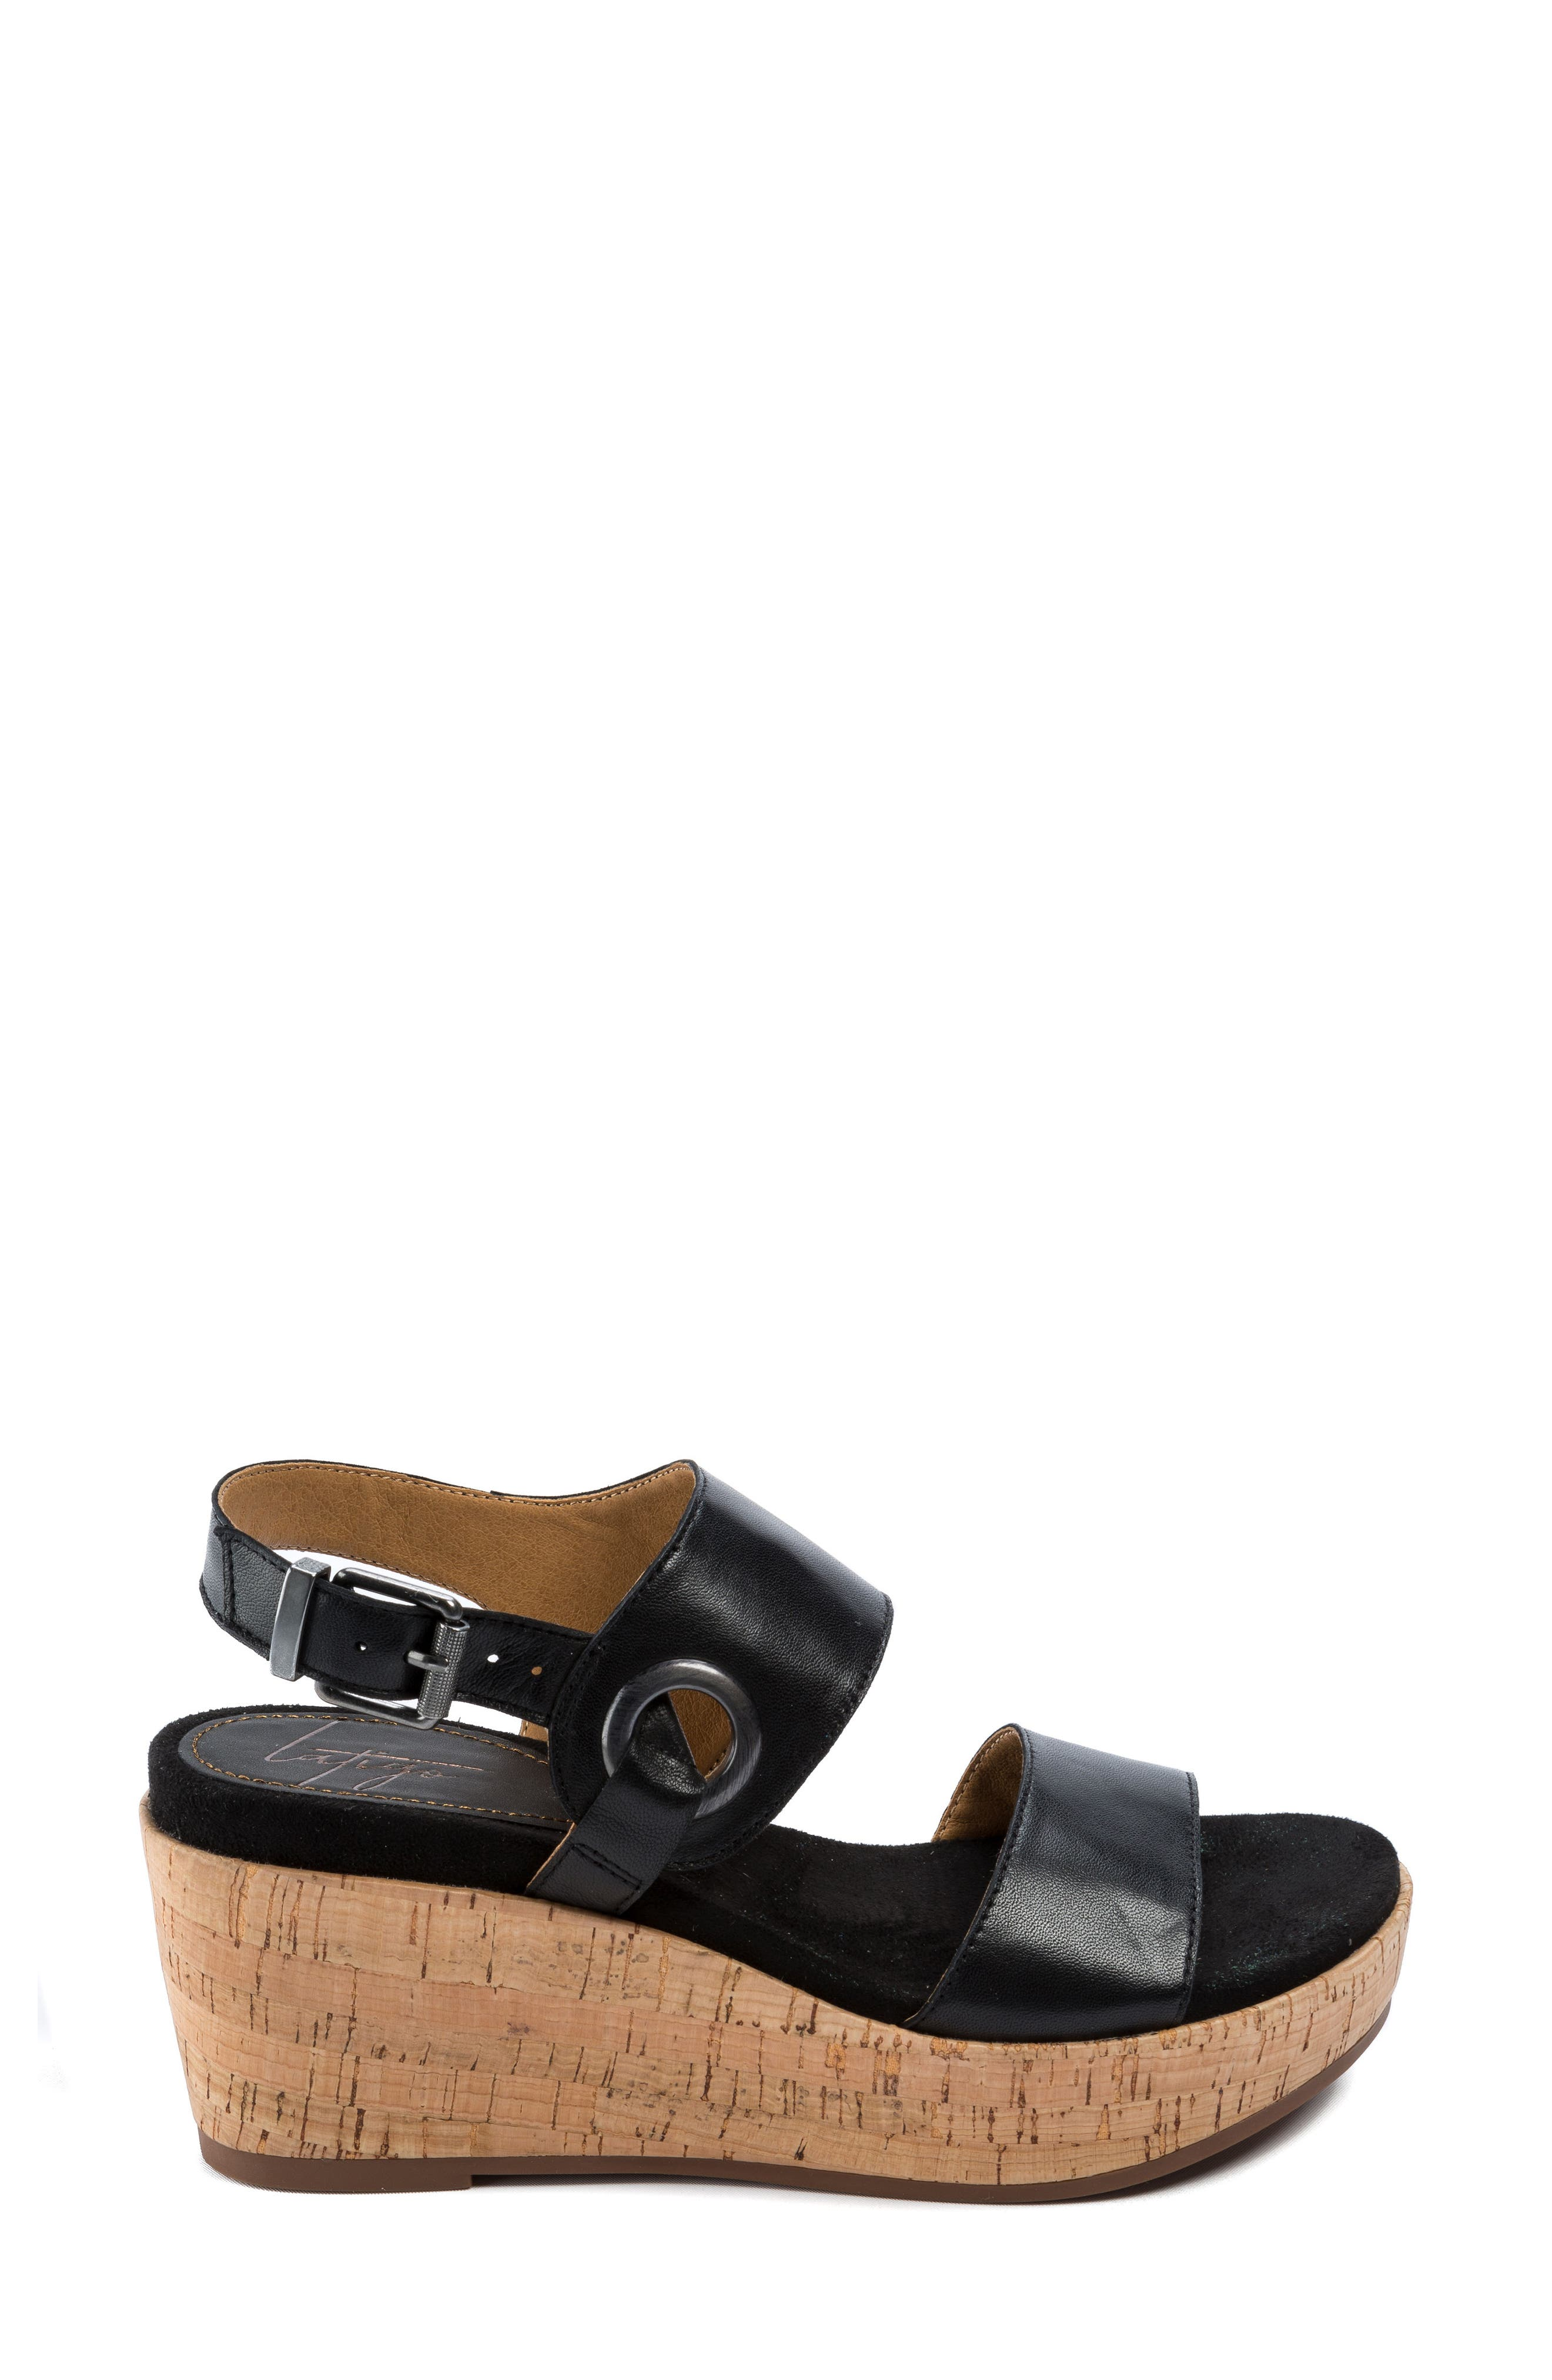 Lauren Platform Wedge Sandal,                             Alternate thumbnail 3, color,                             001